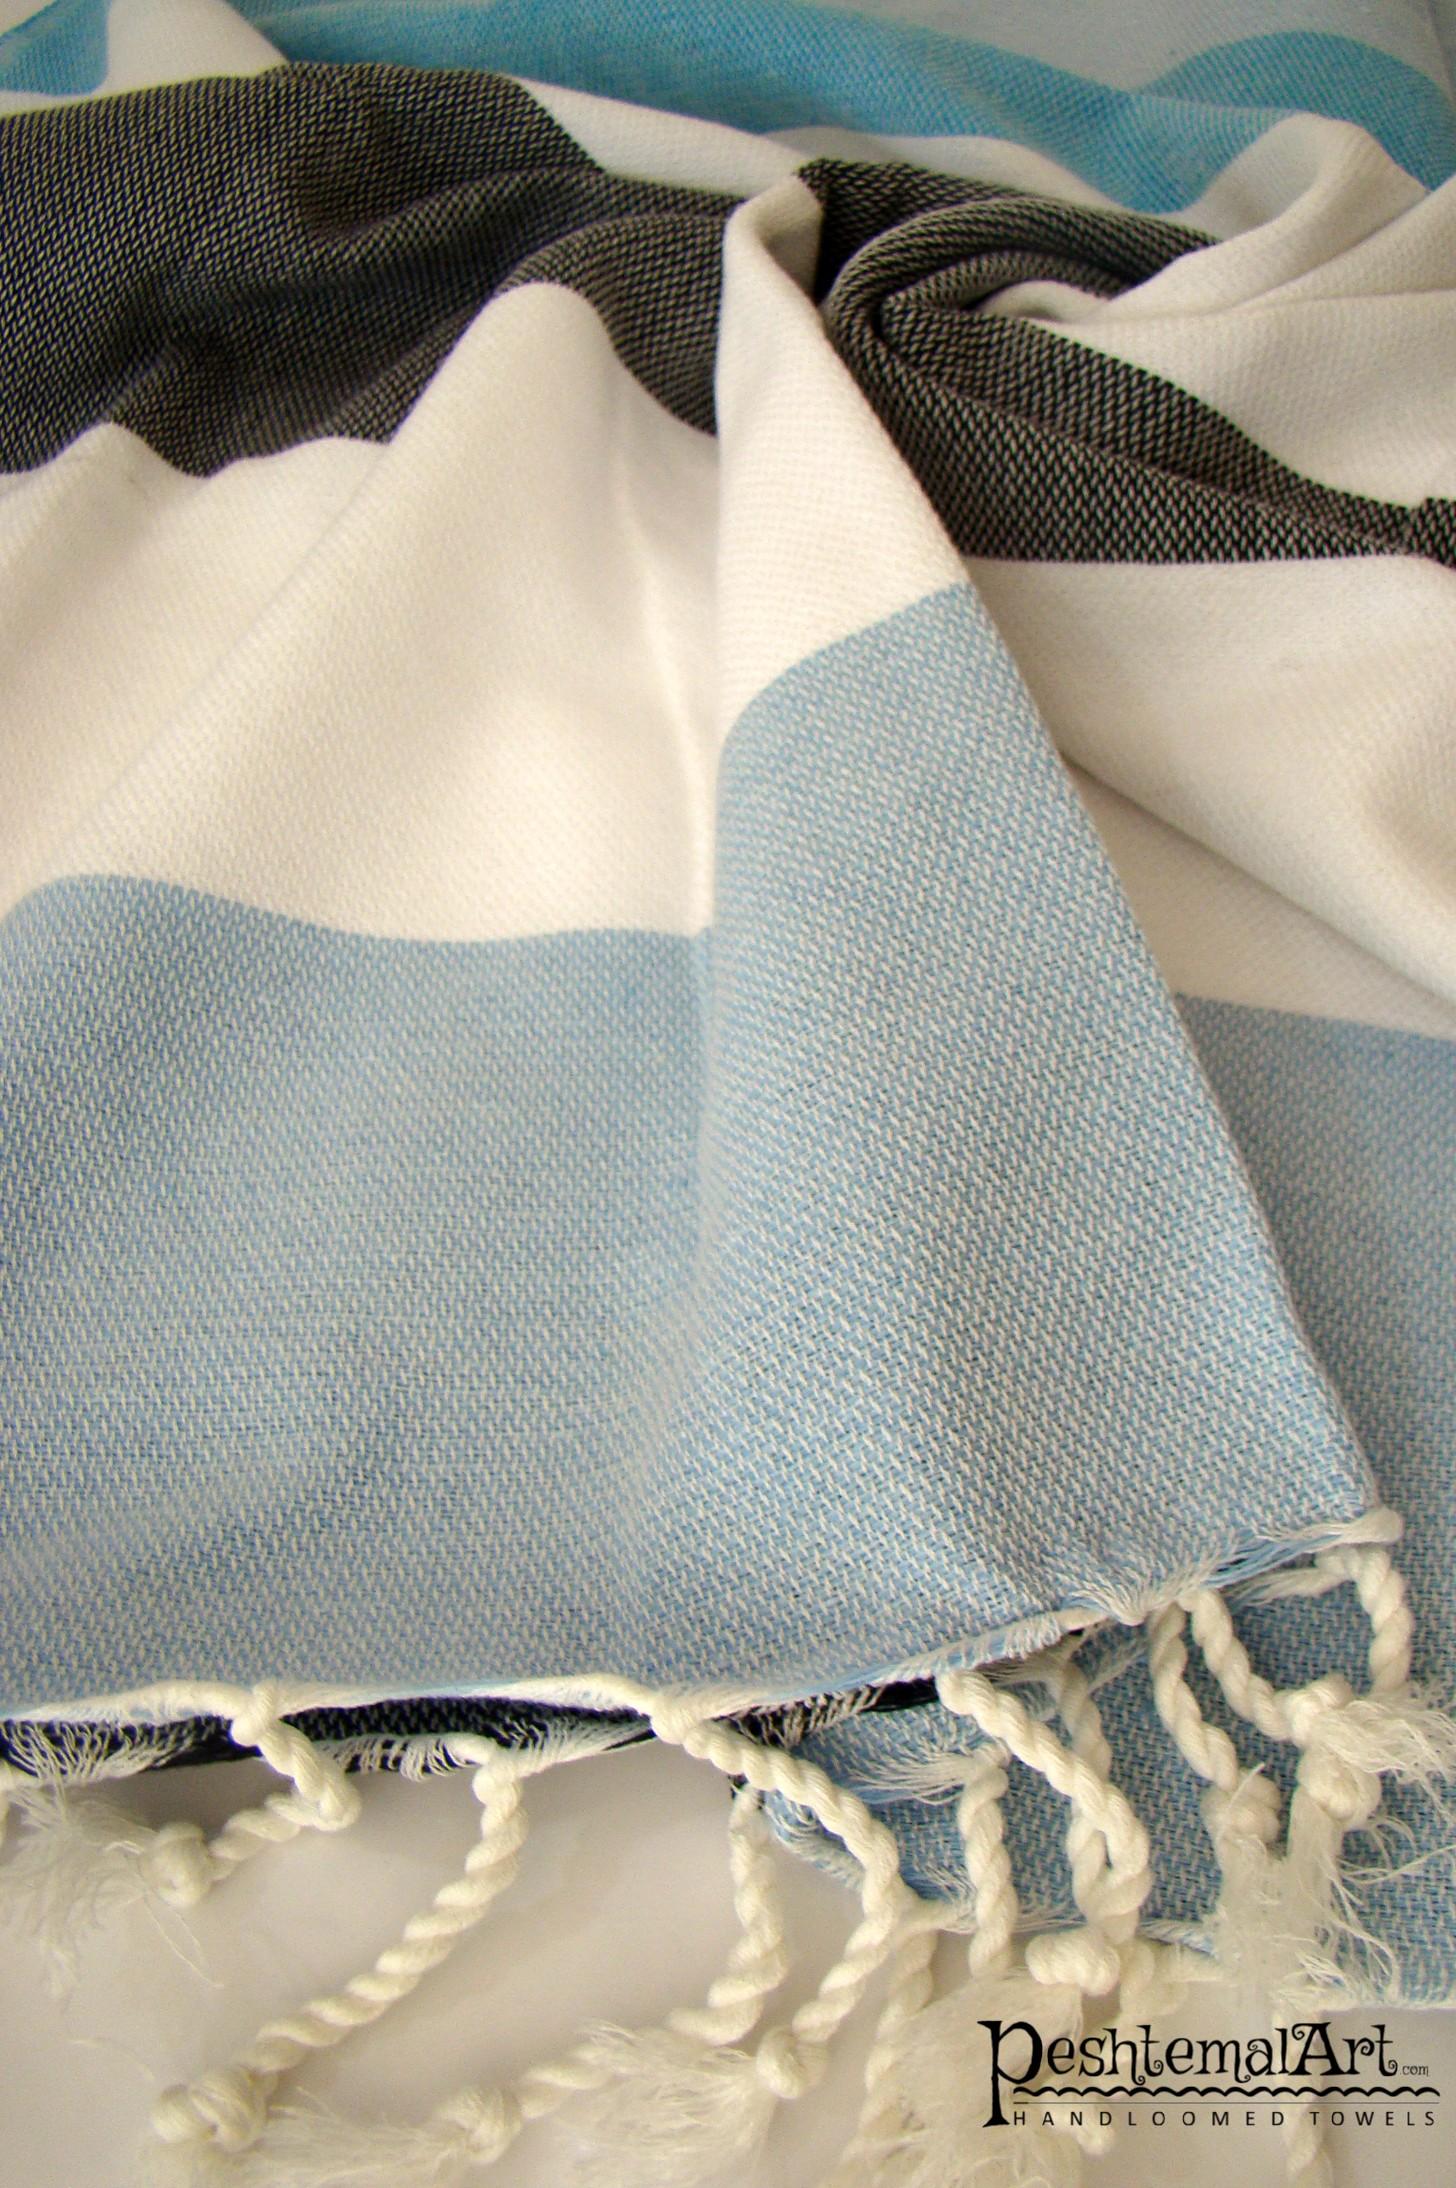 Metropol Beach Towel - Blue, Dark Blue, White